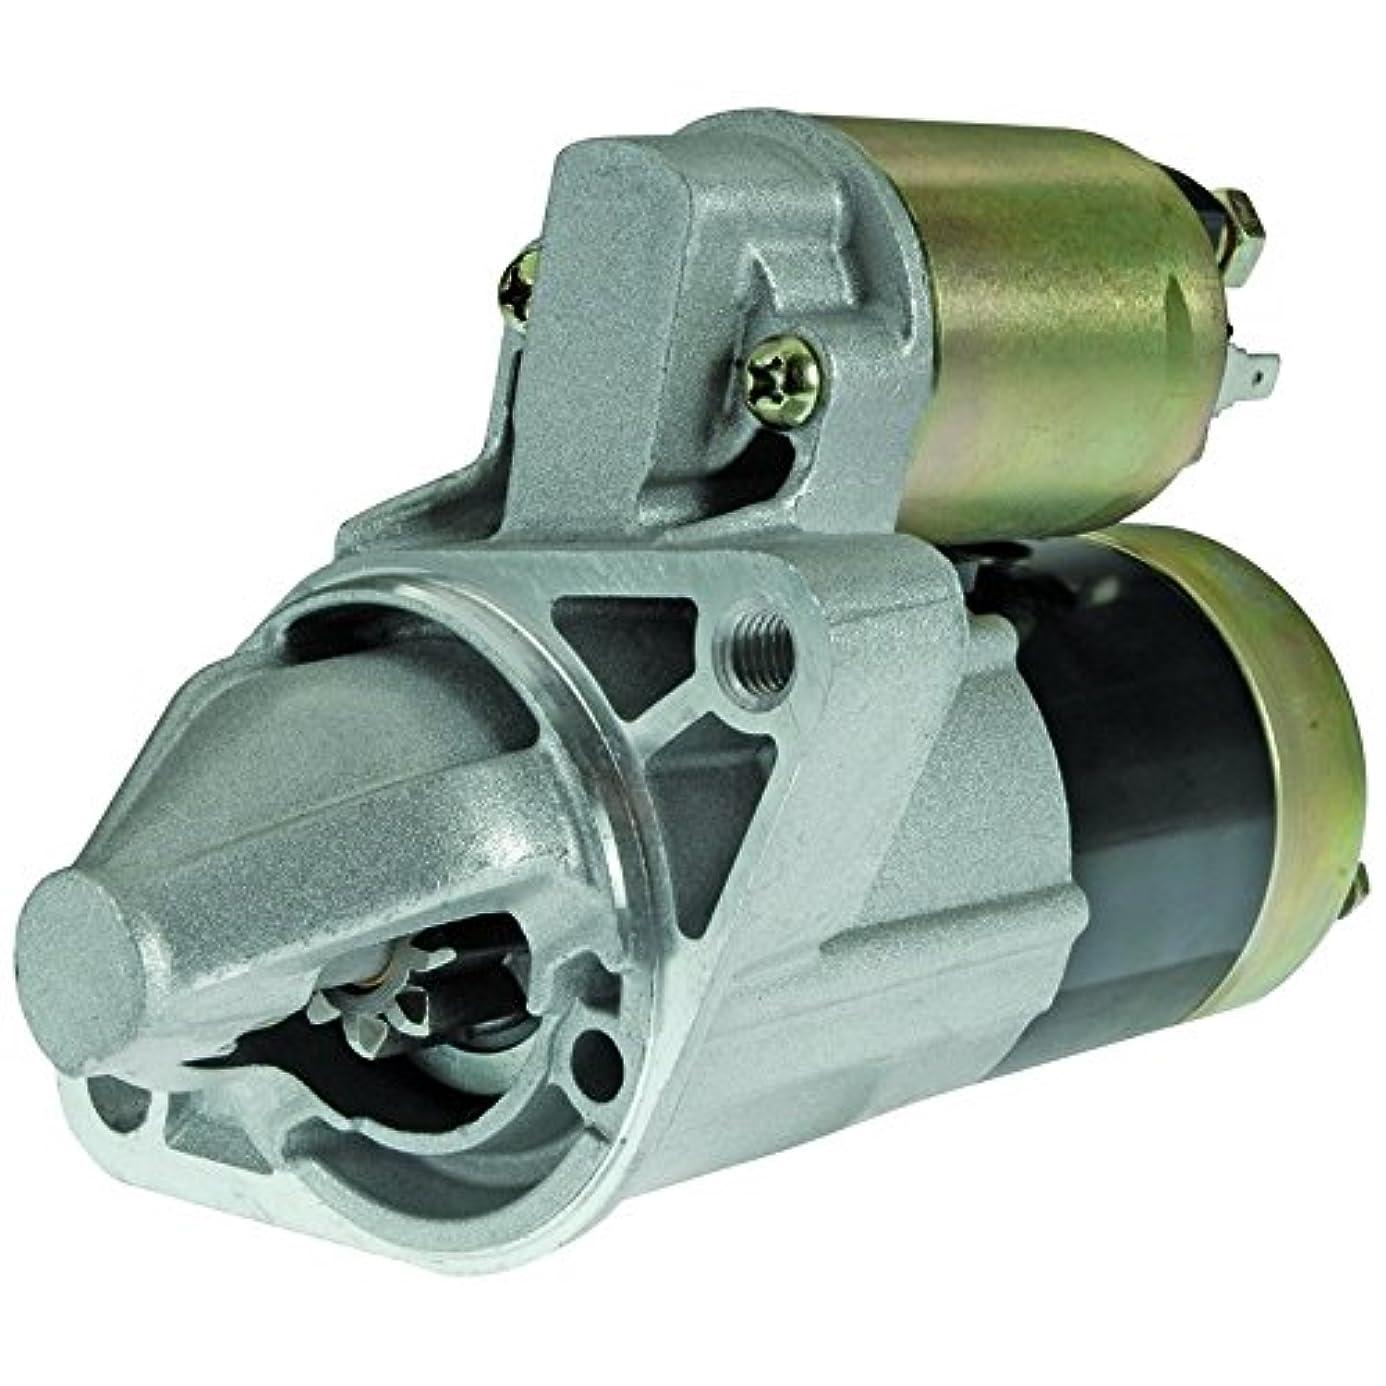 Premier Gear PG-17849 Professional Grade New Starter cmm7598913